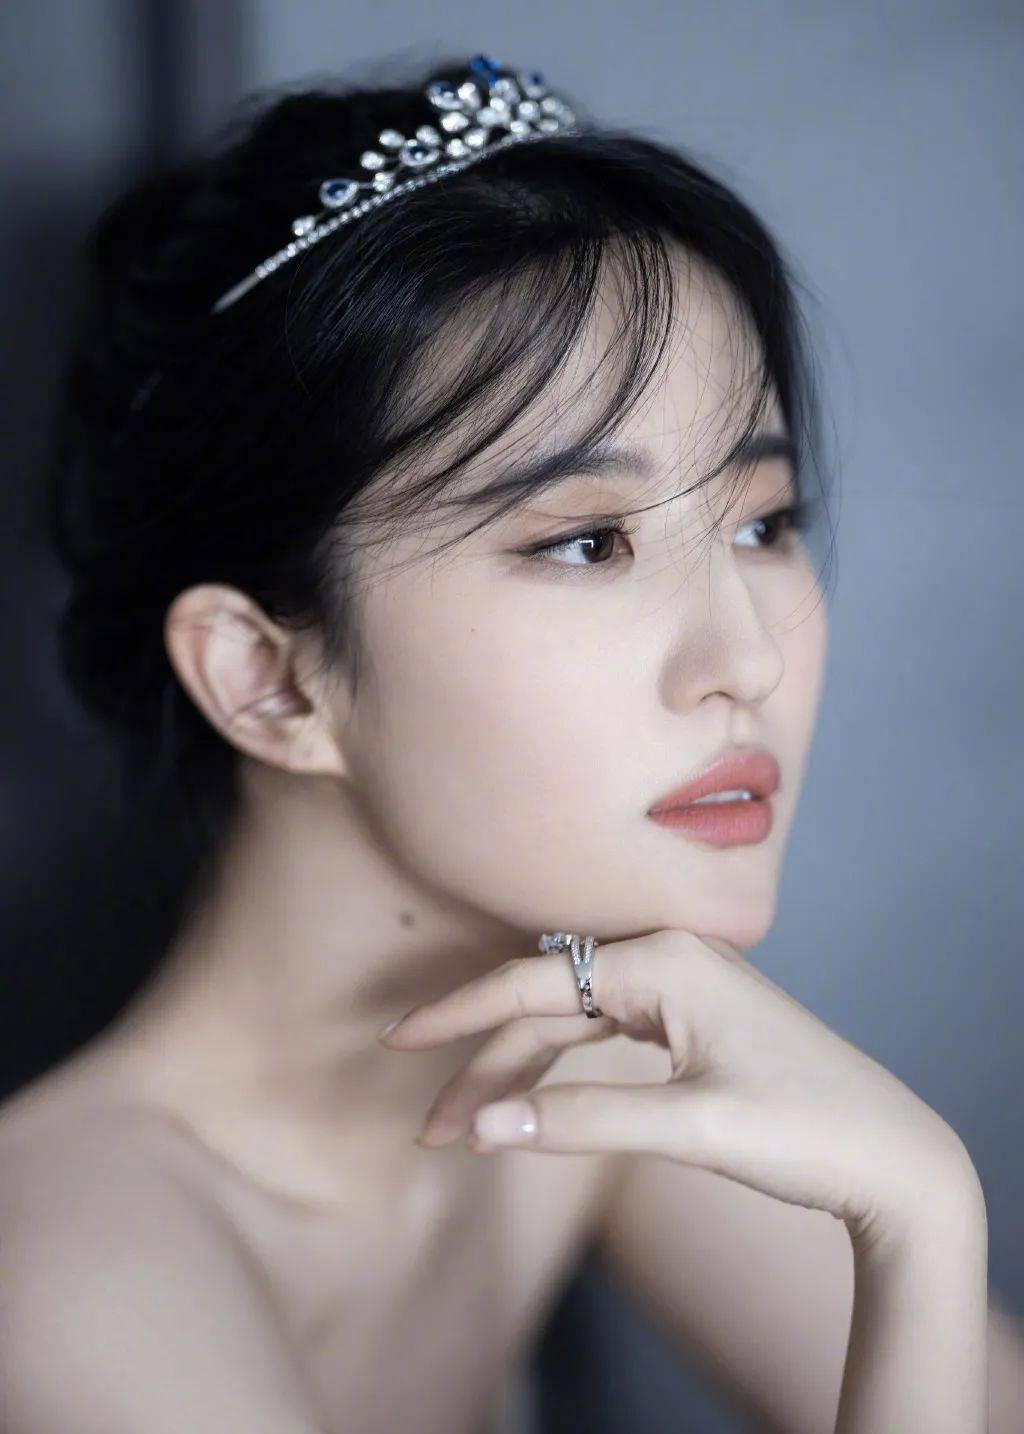 天鹅公主刘亦菲丨赏色